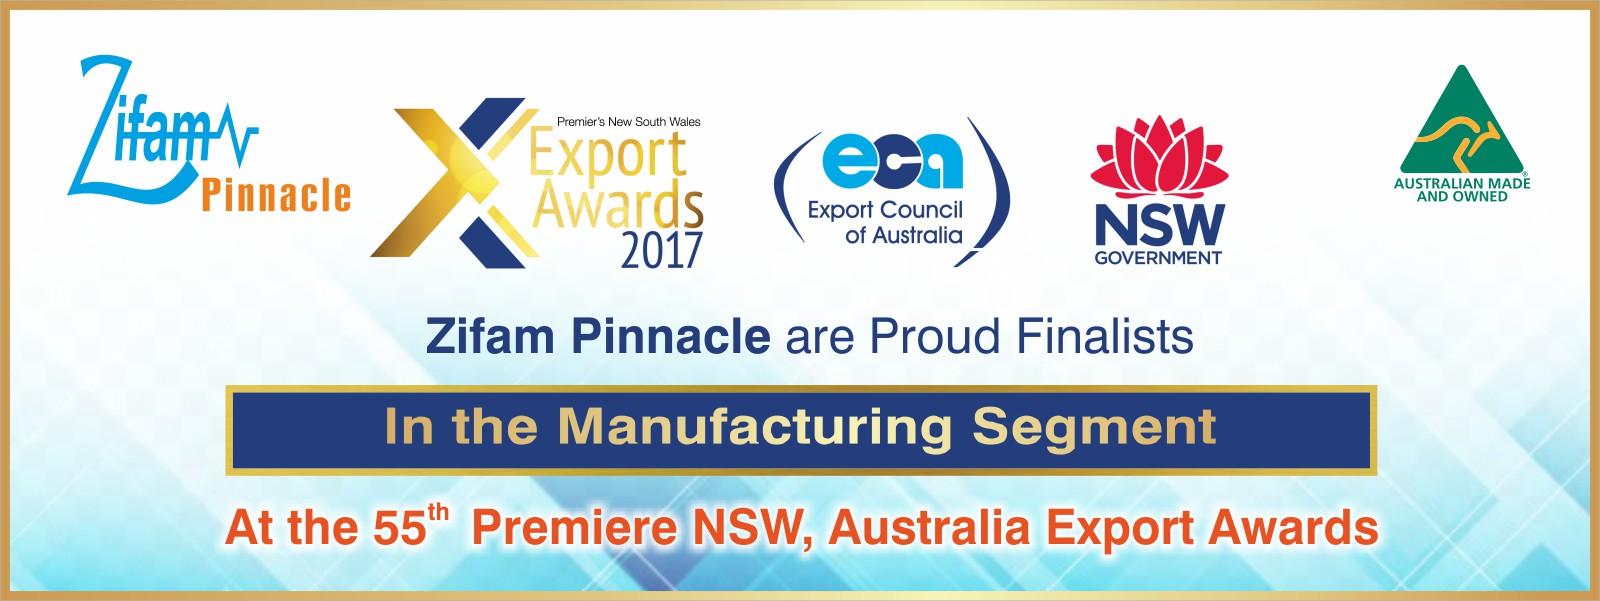 NSW-Export-Awards